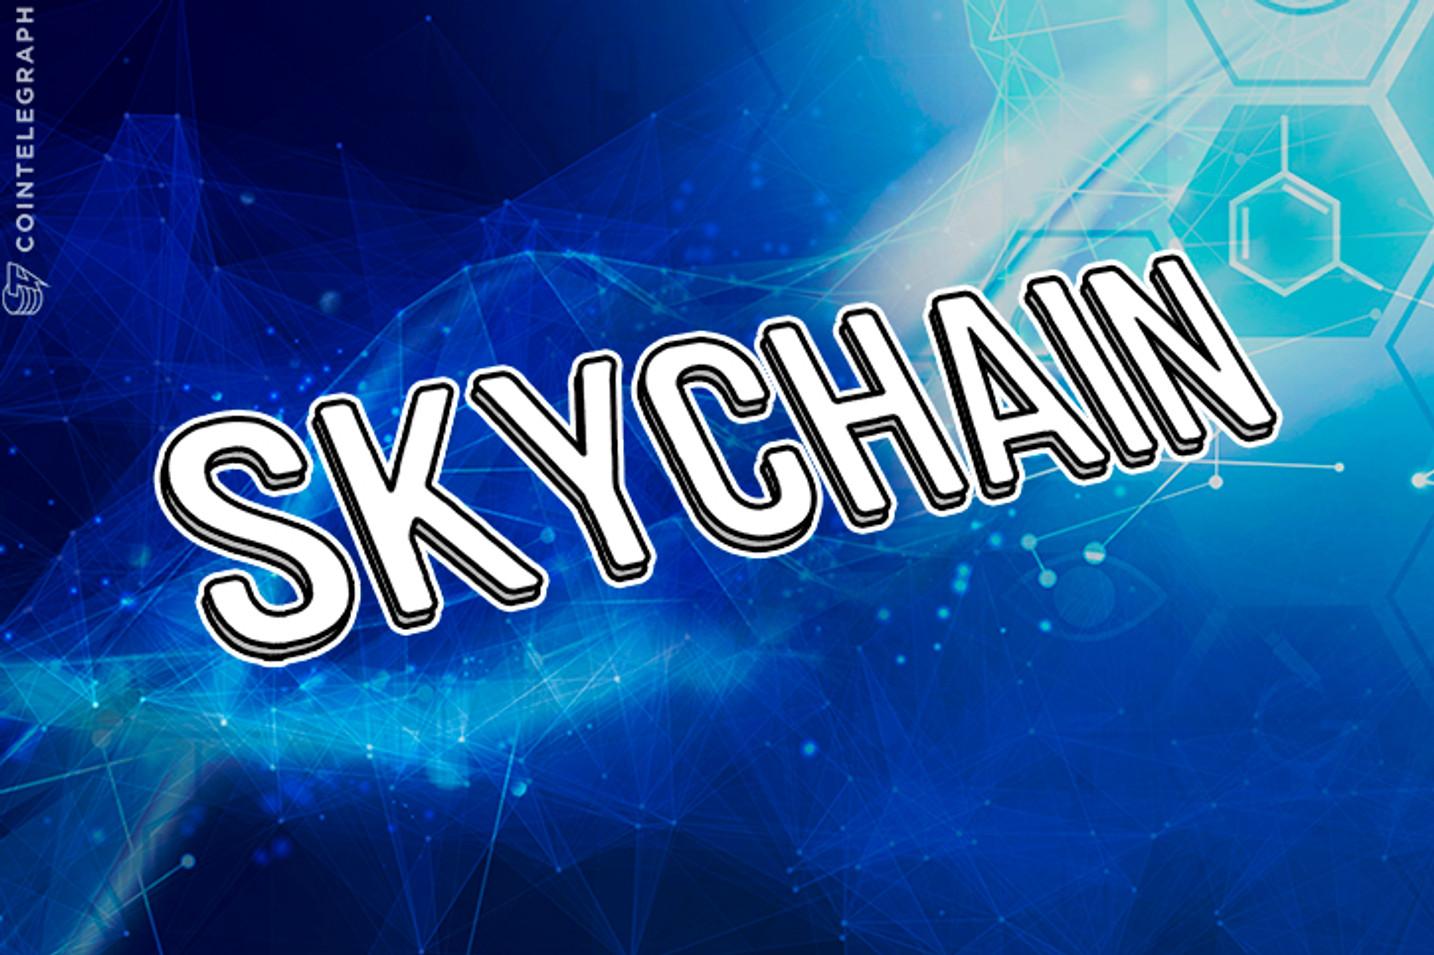 The Blockchain Startup Skychain is Going to Revolutionize Digital Medicine